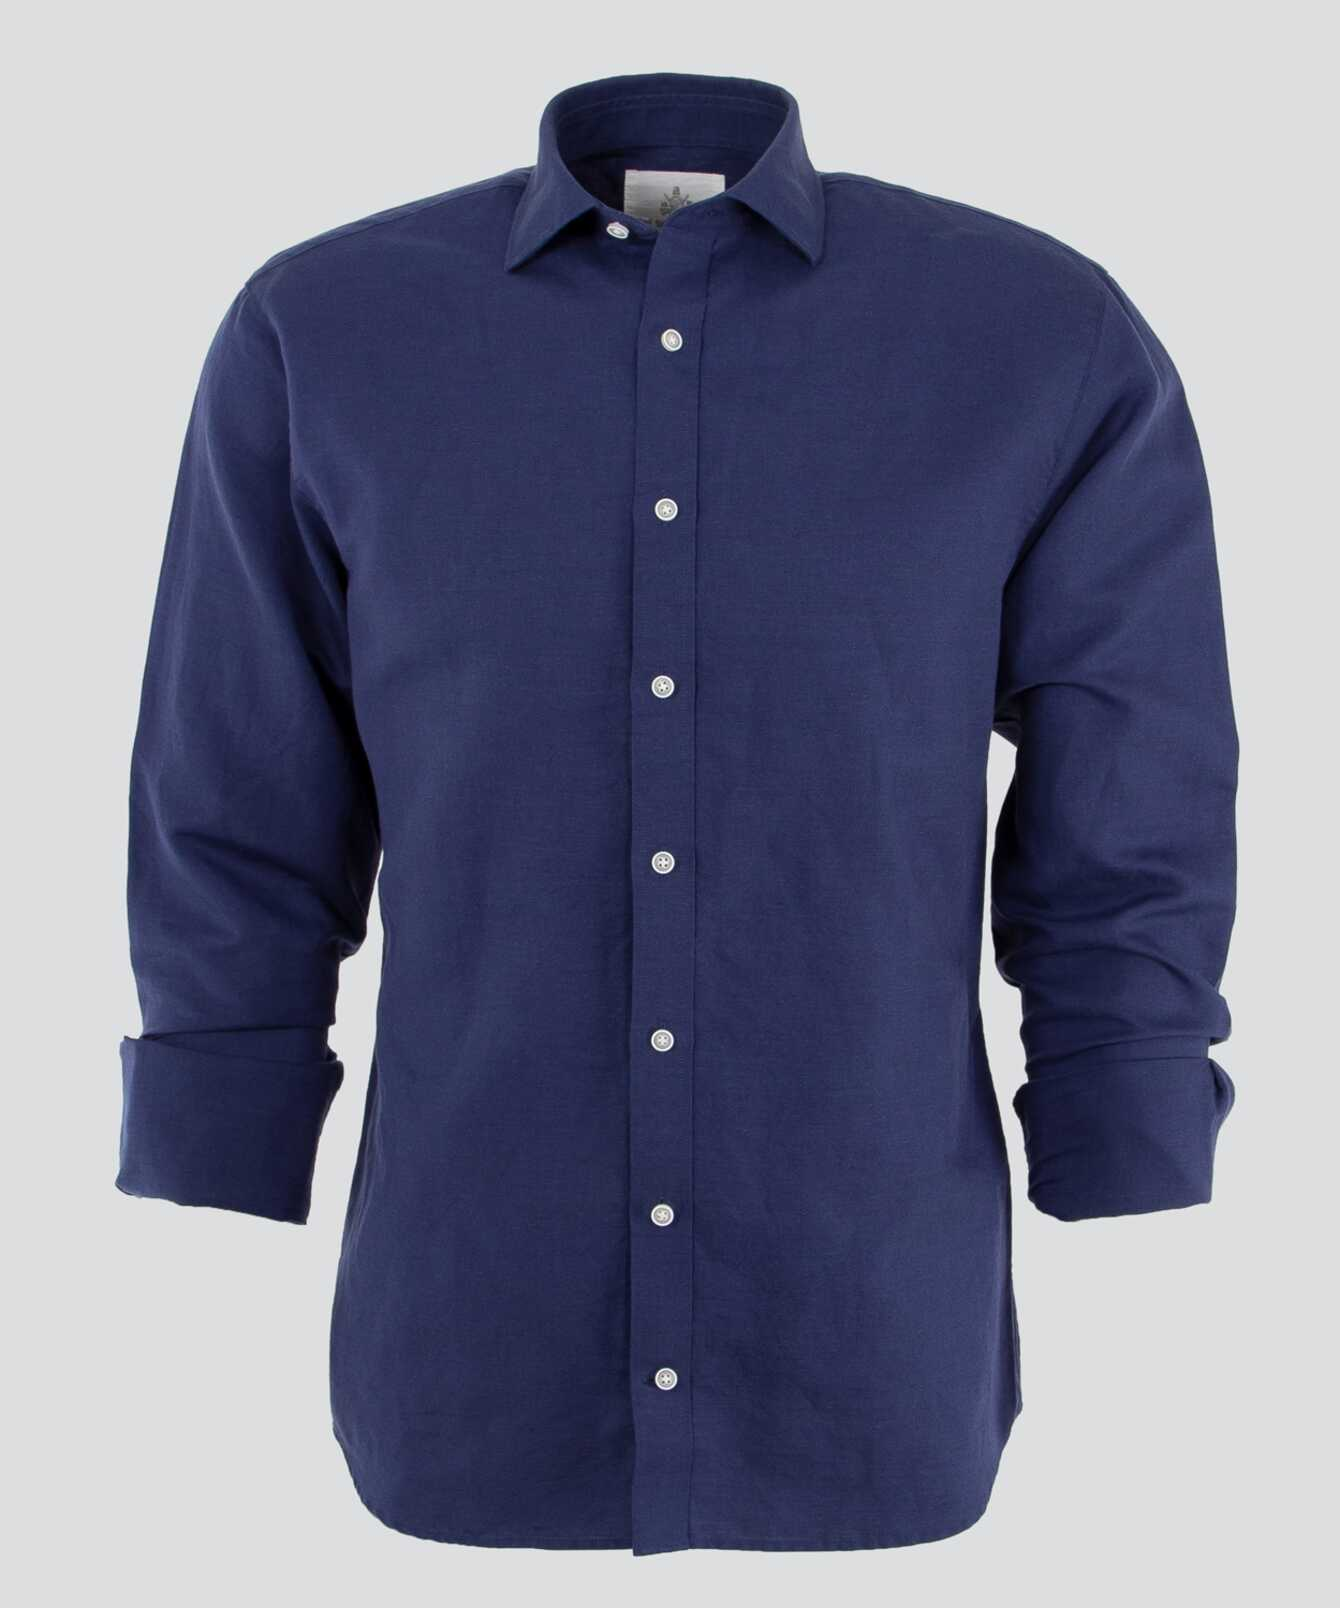 Shirt Portofino Linen  The Shirt Factory